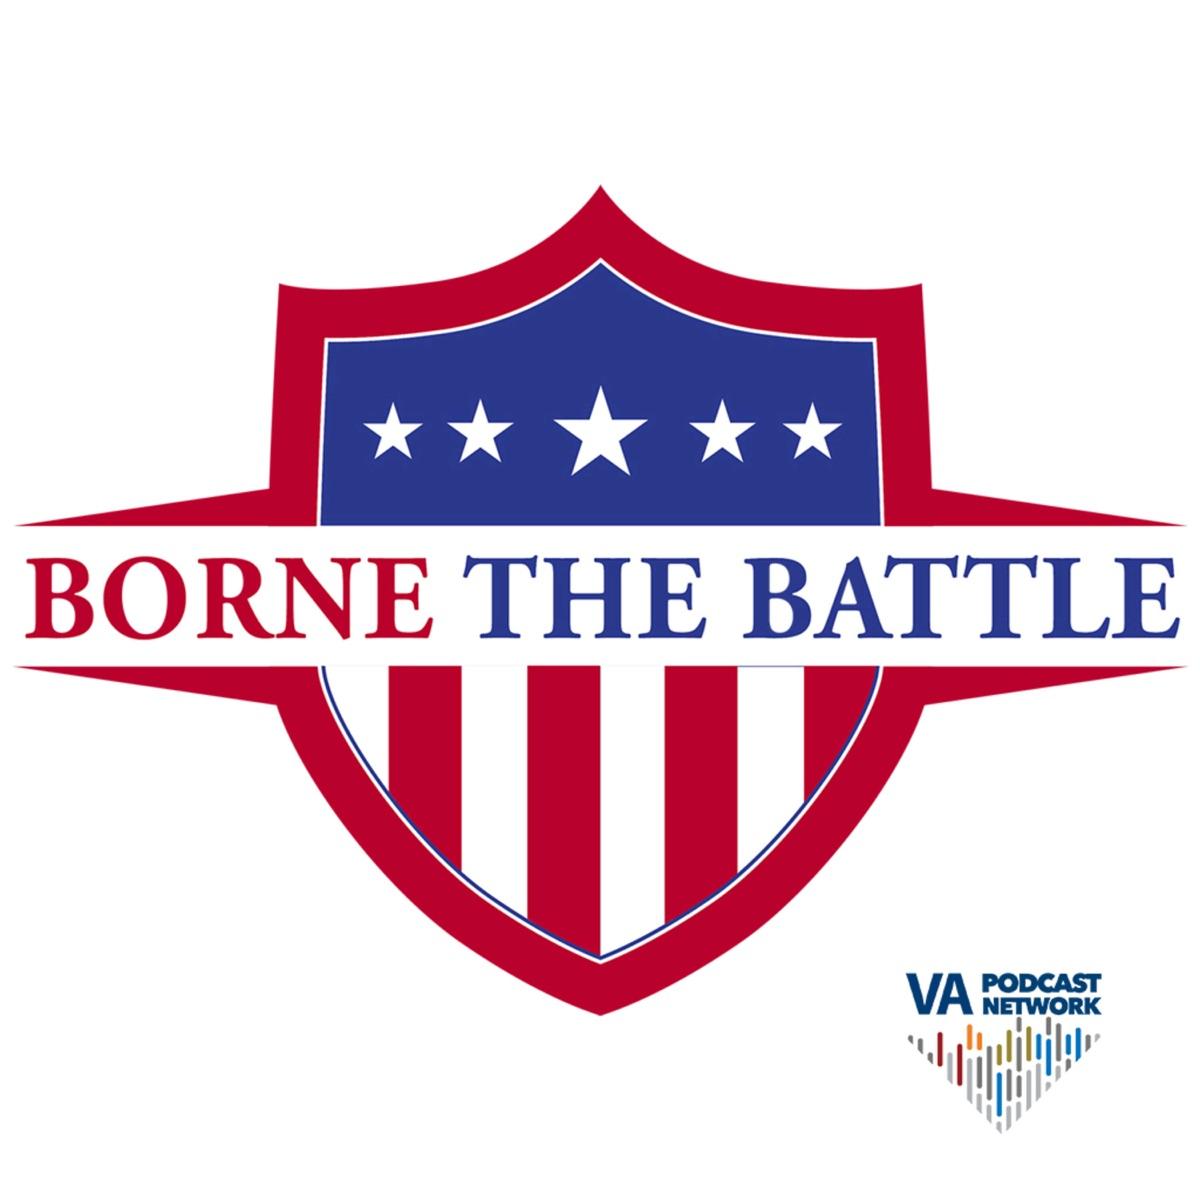 Borne the Battle